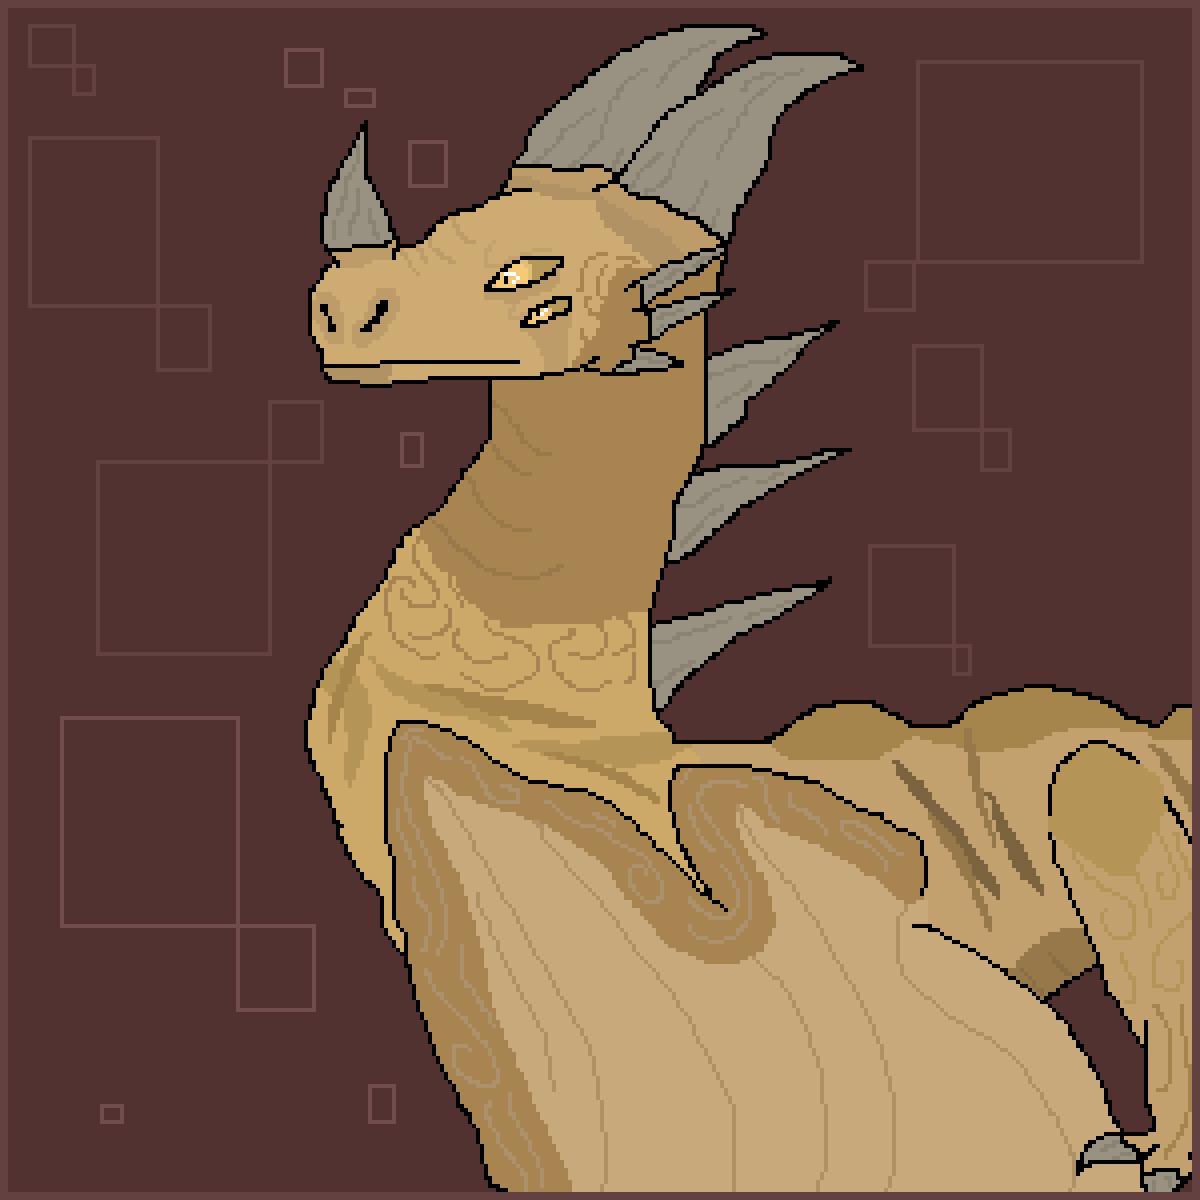 Dragon by Panicatthedisco